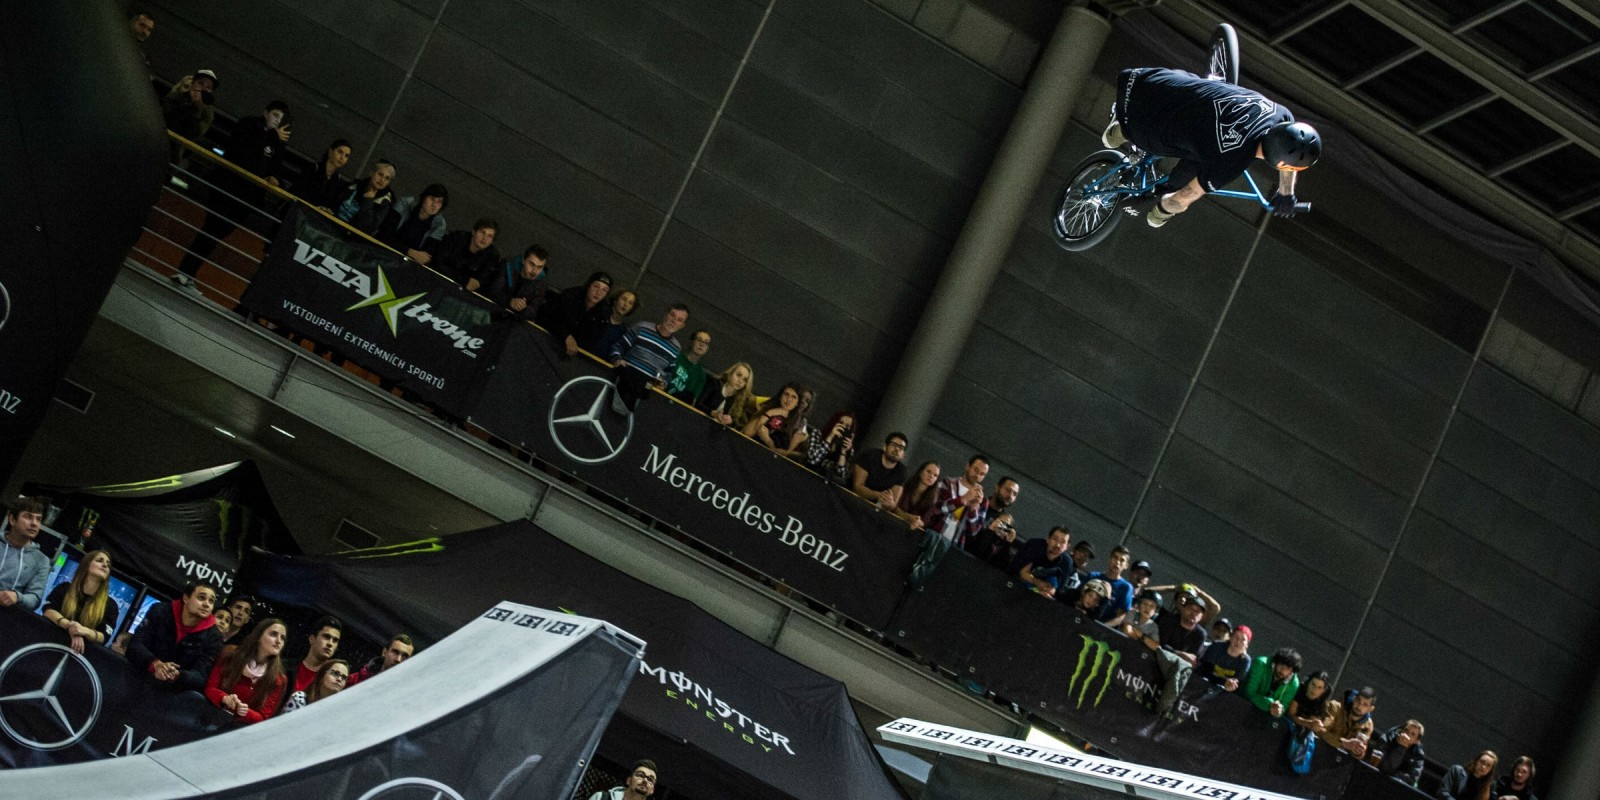 MERCEDES-BENZGRANDBMX2017Czech BMX park championship in Brno